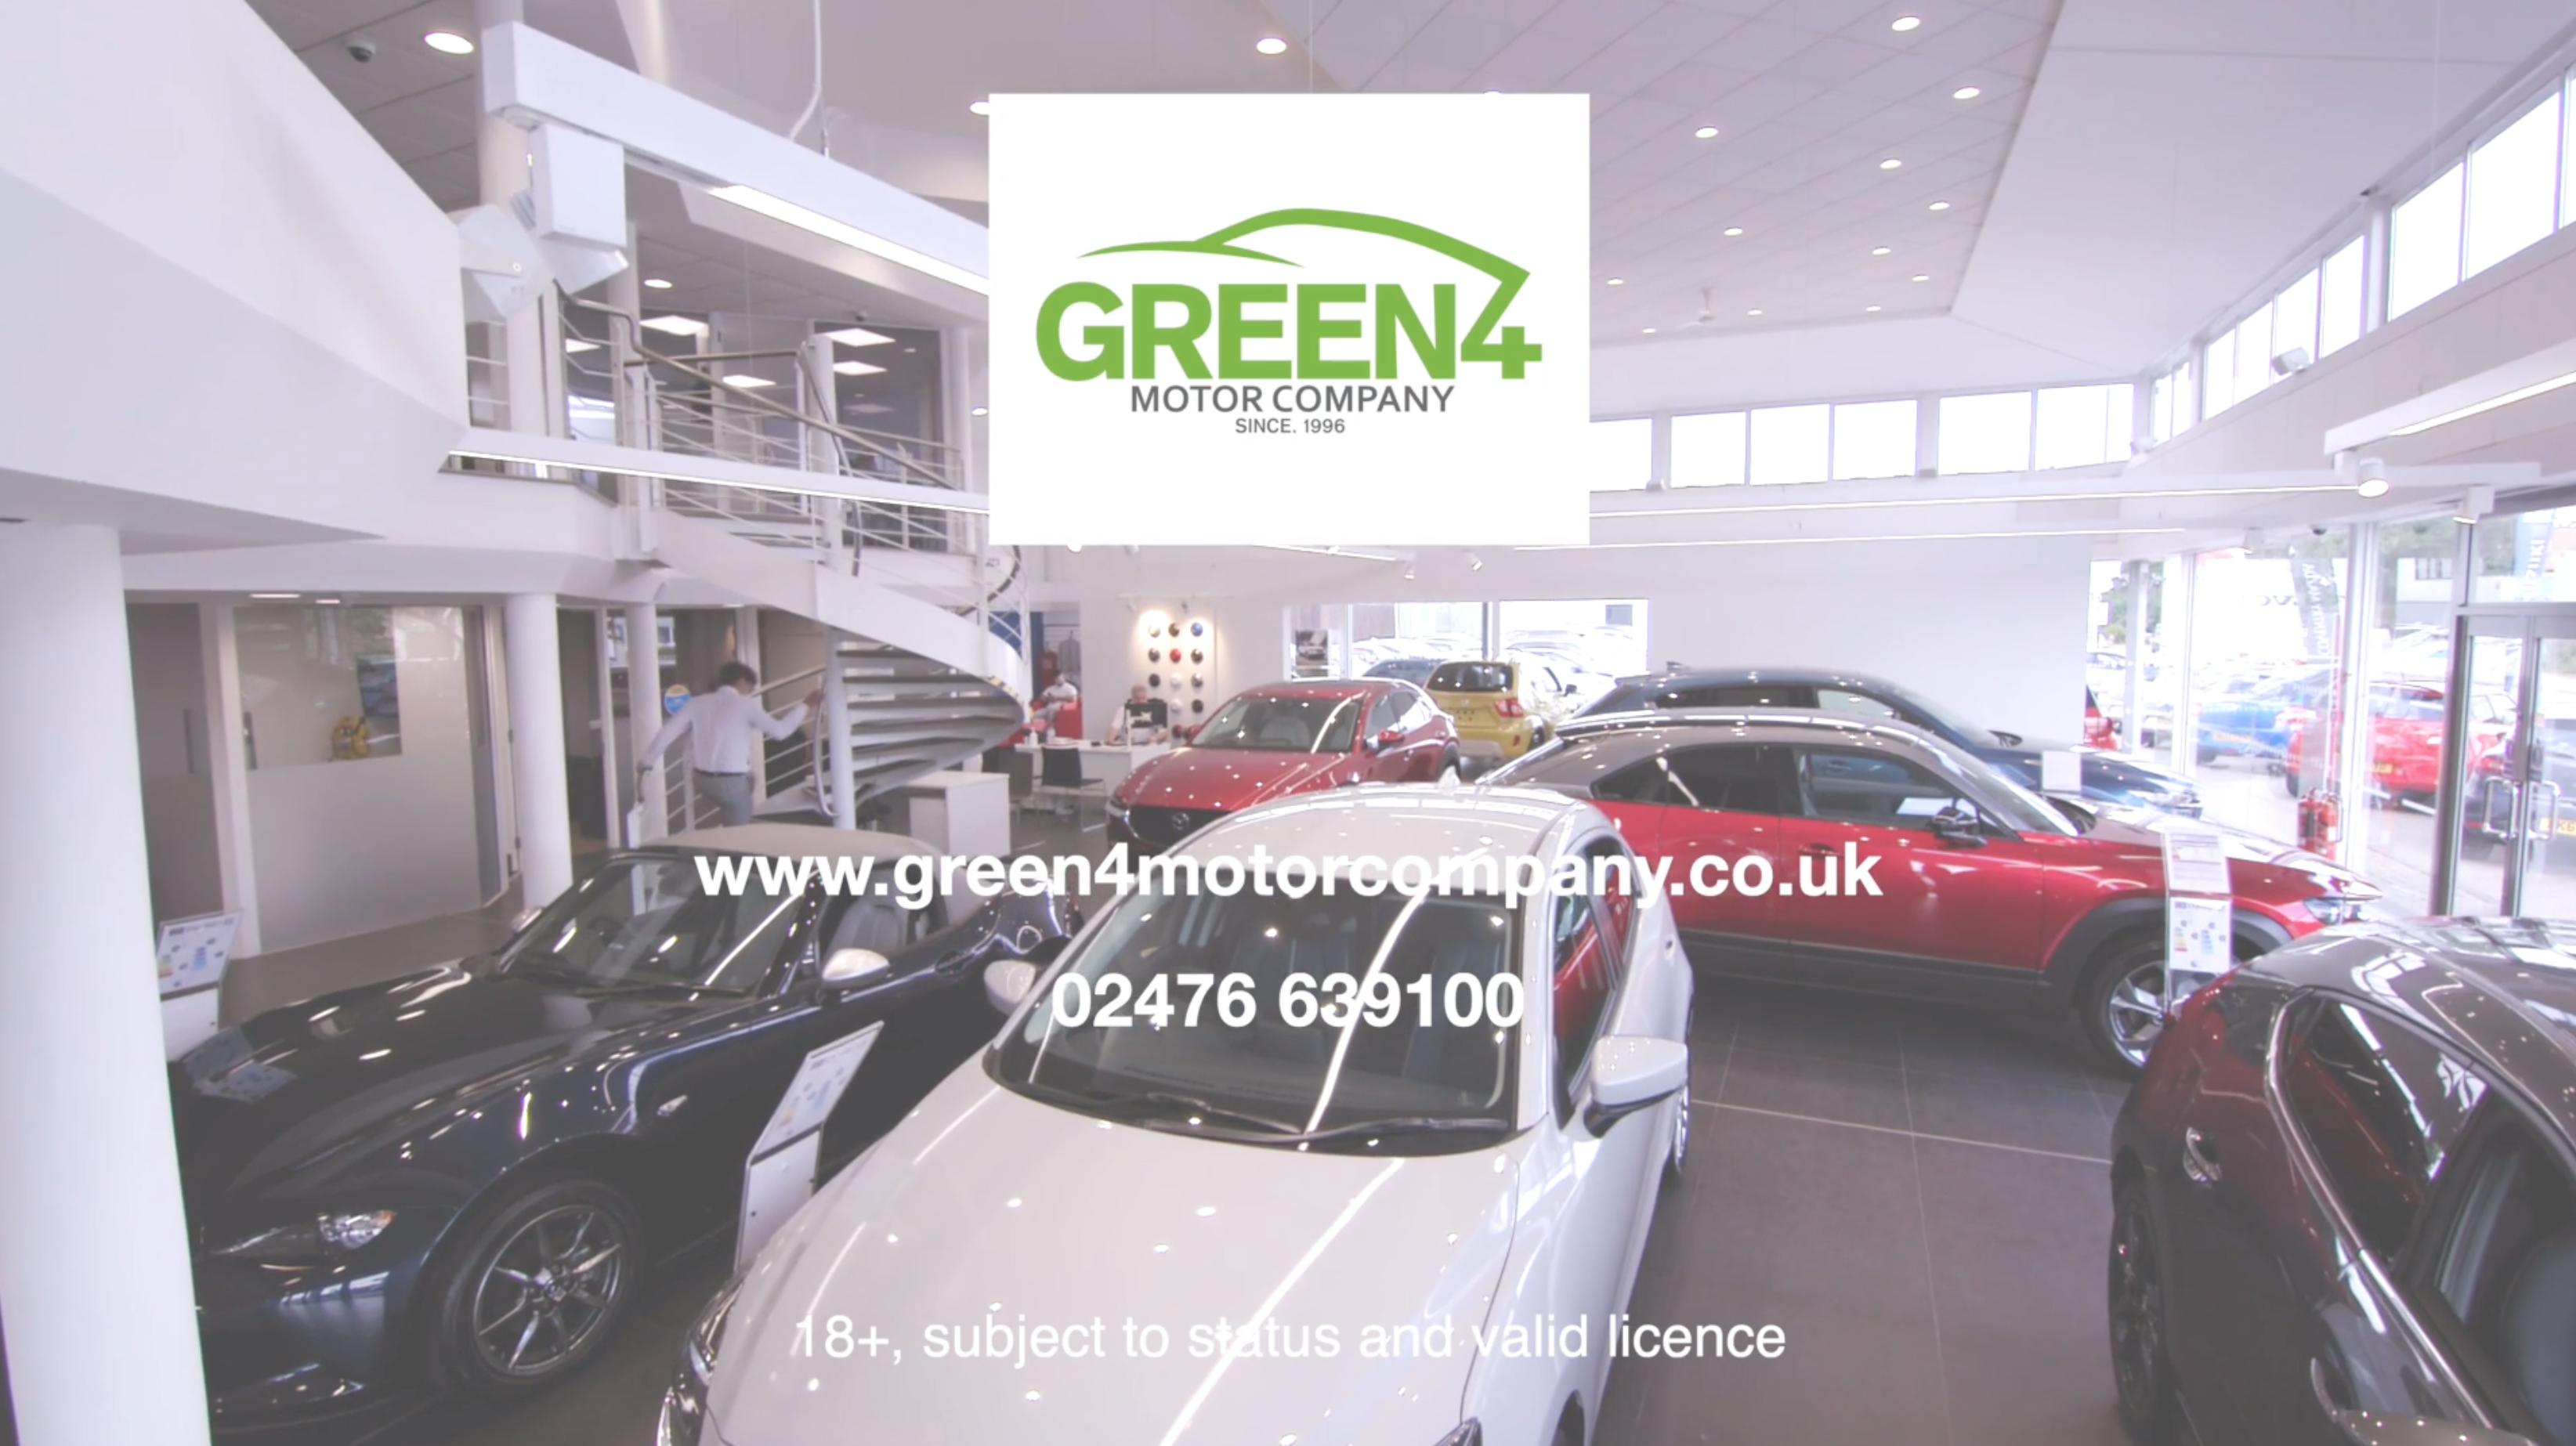 Green 4 Motor Company Sky Adsmart TV advert